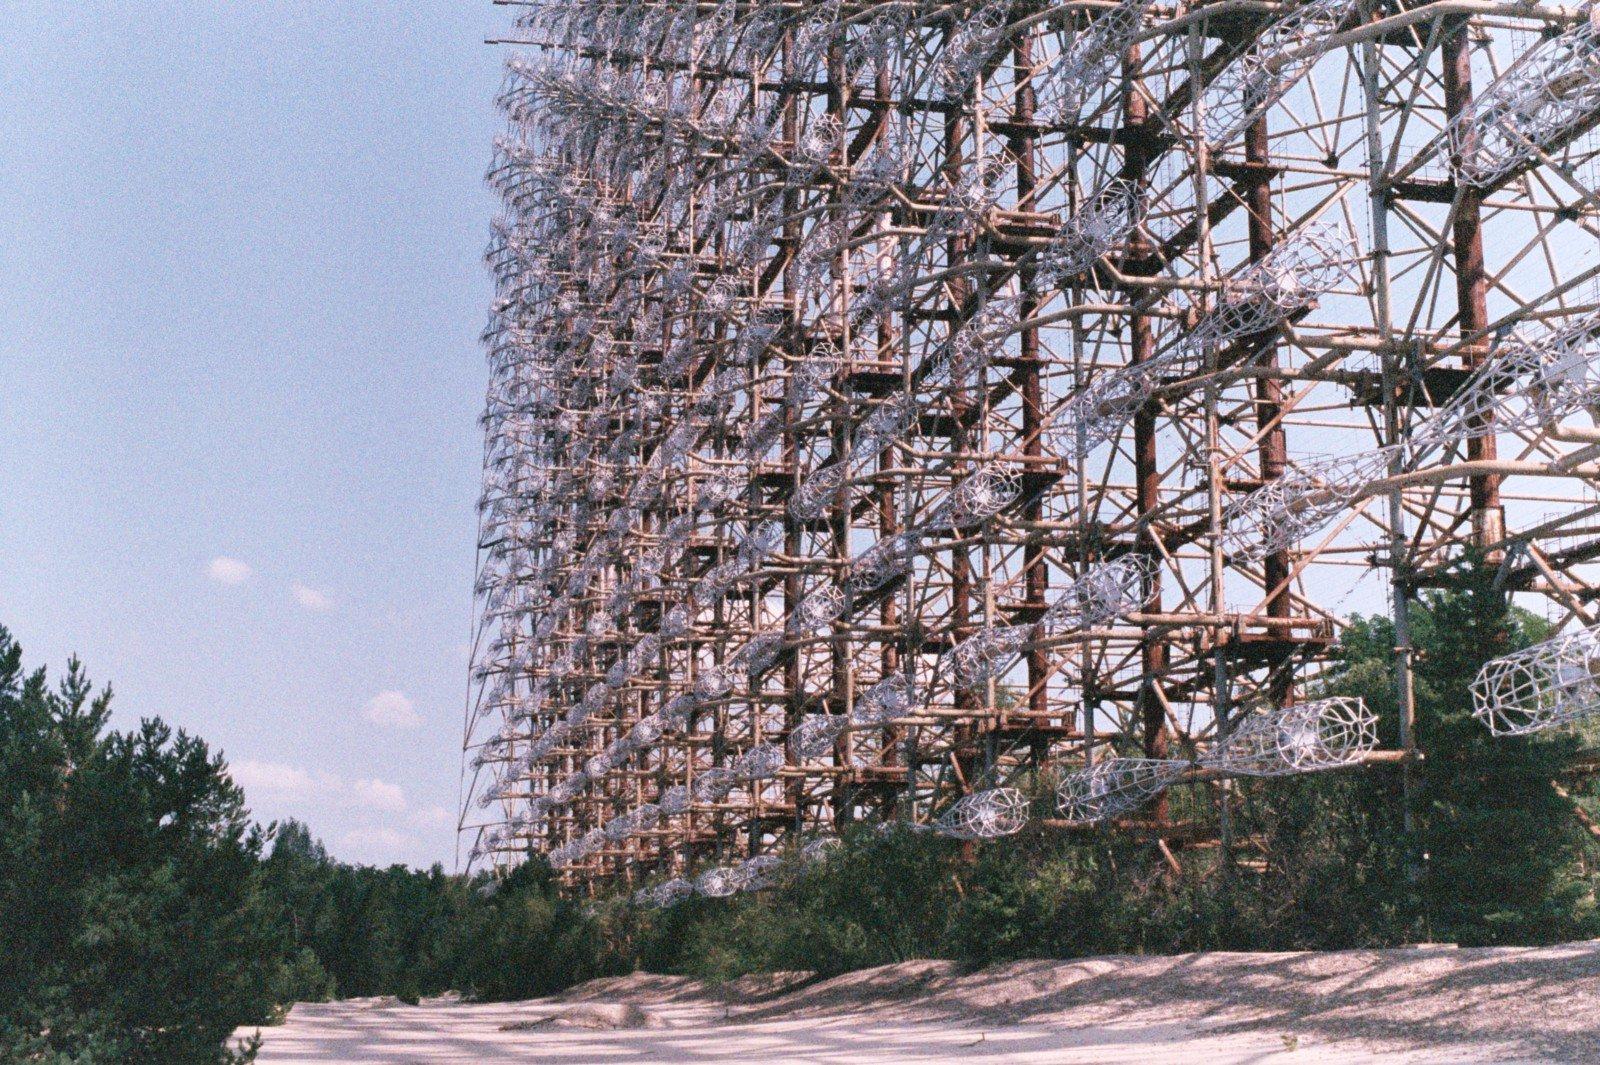 snaeking-into-chernobyl1 SNEAKING INTO CHERNOBYL